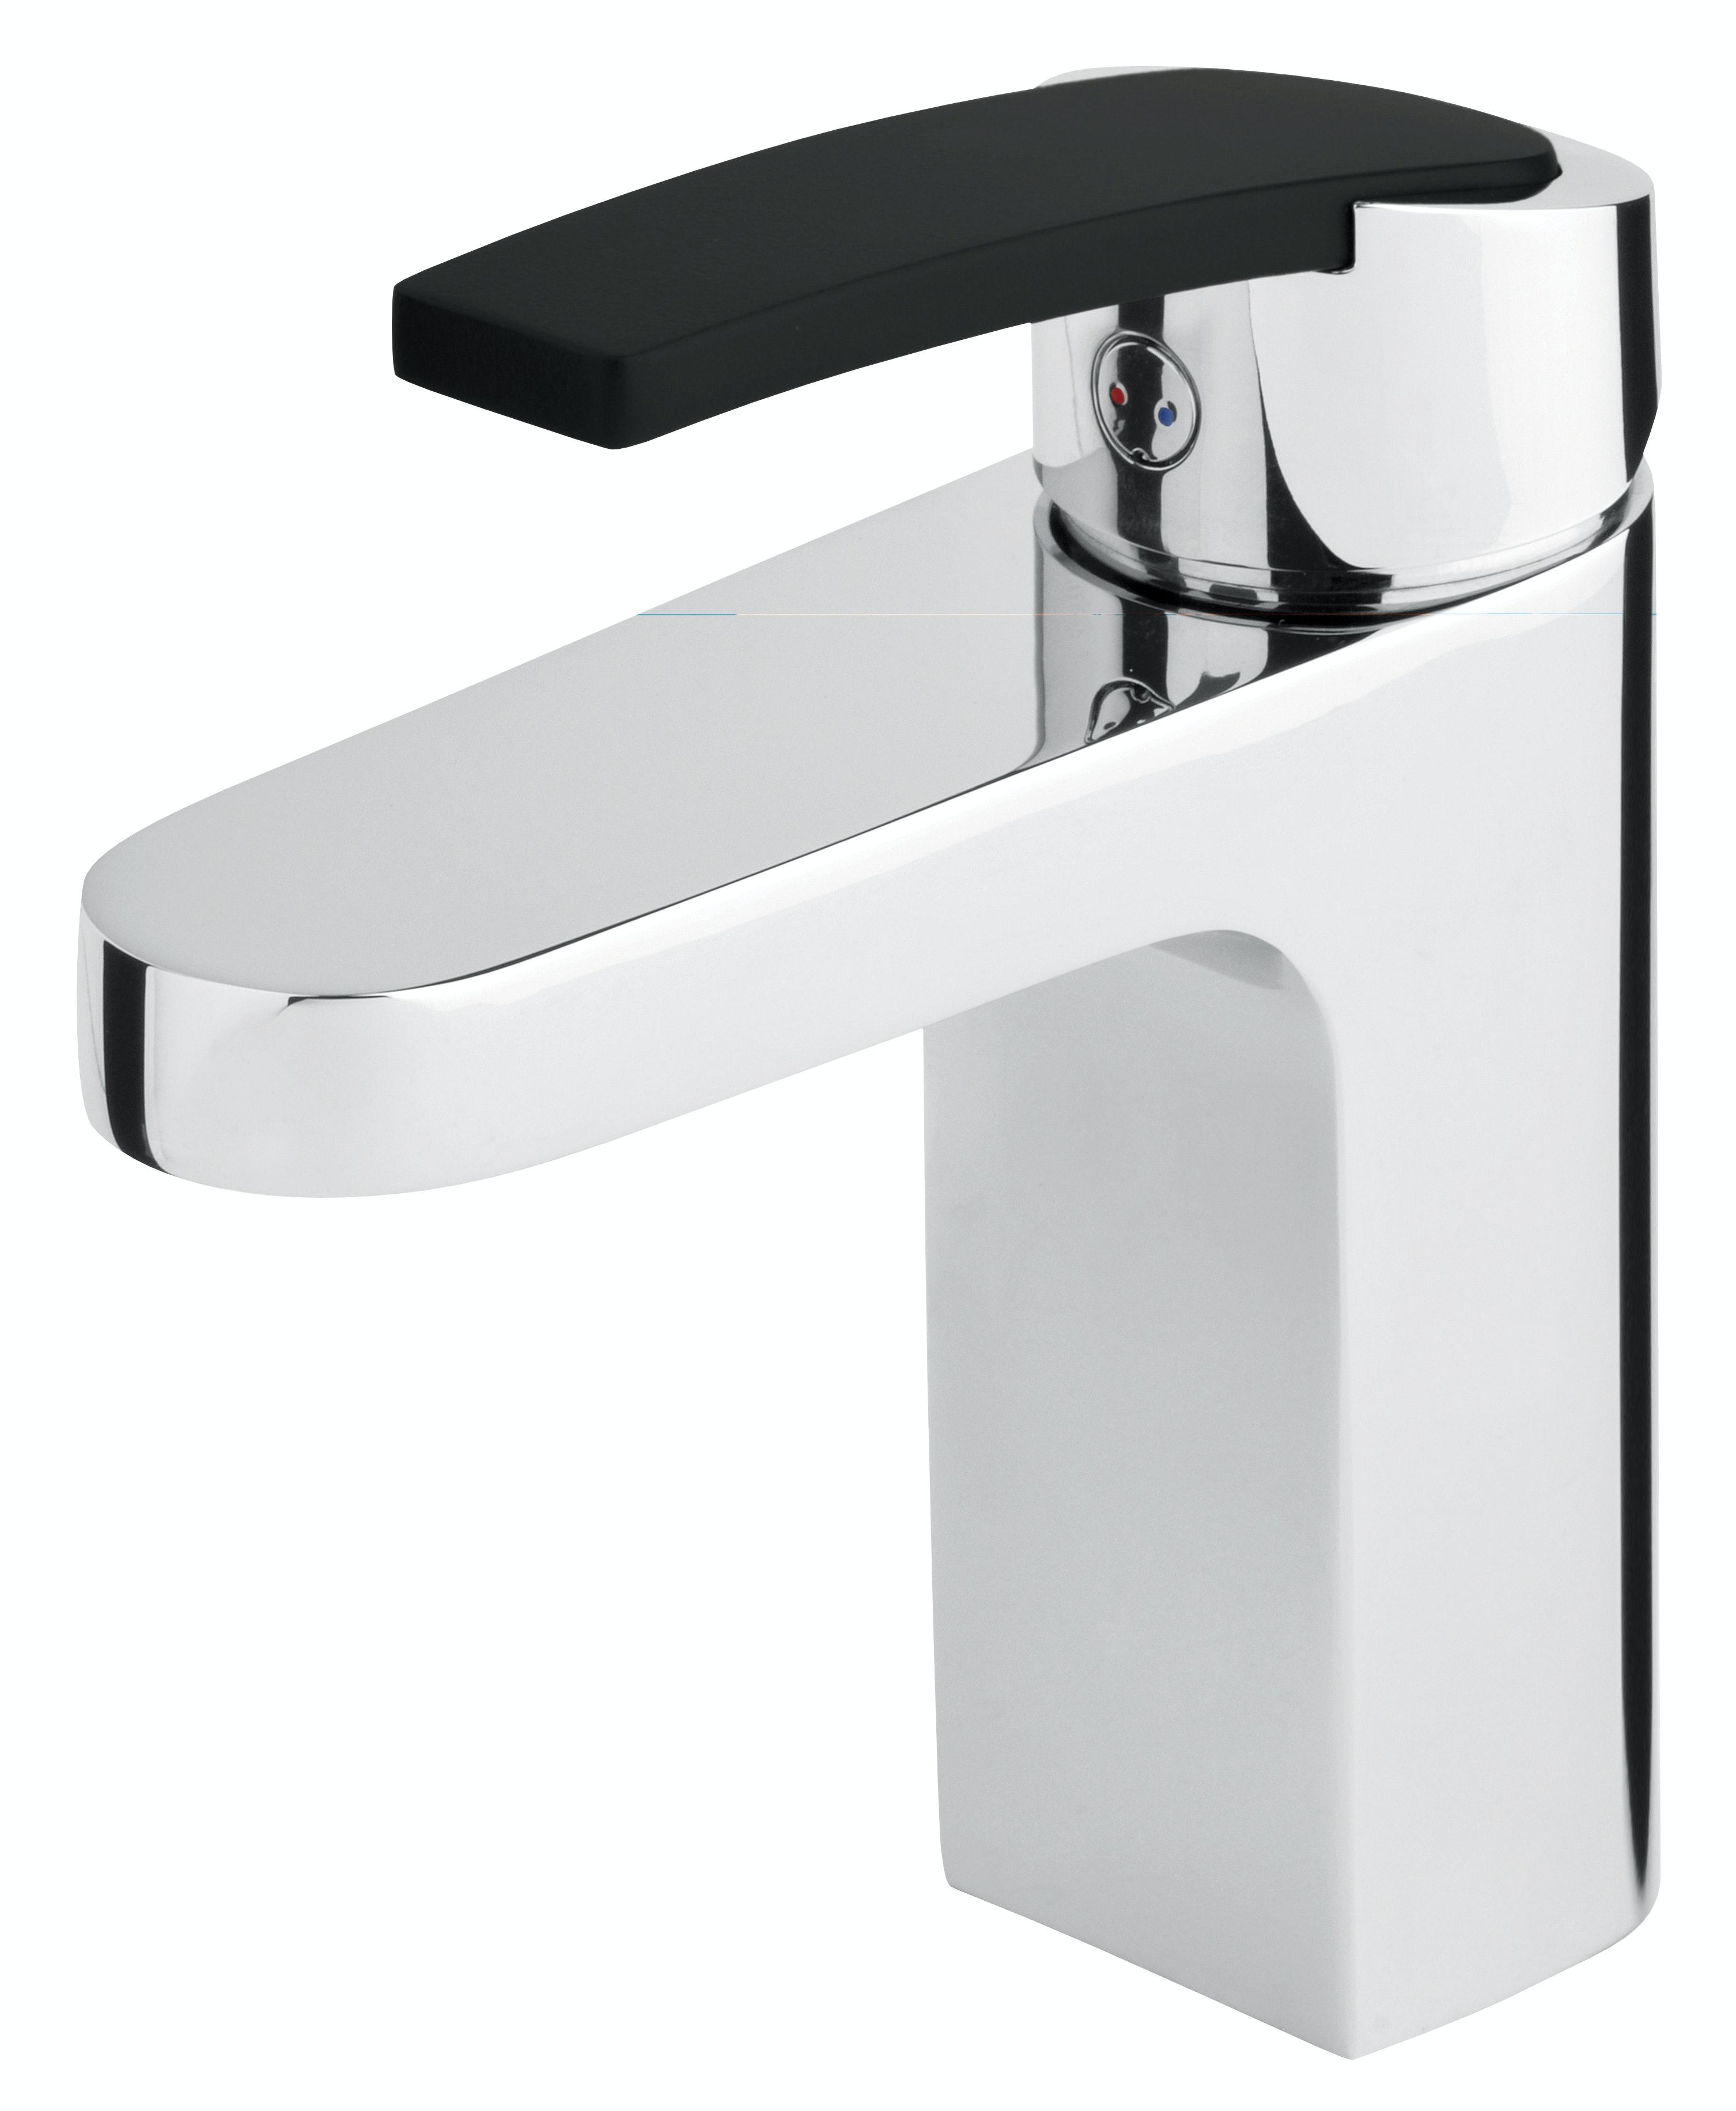 Tvättställsblandare Mora Nyxx Krom/Svart